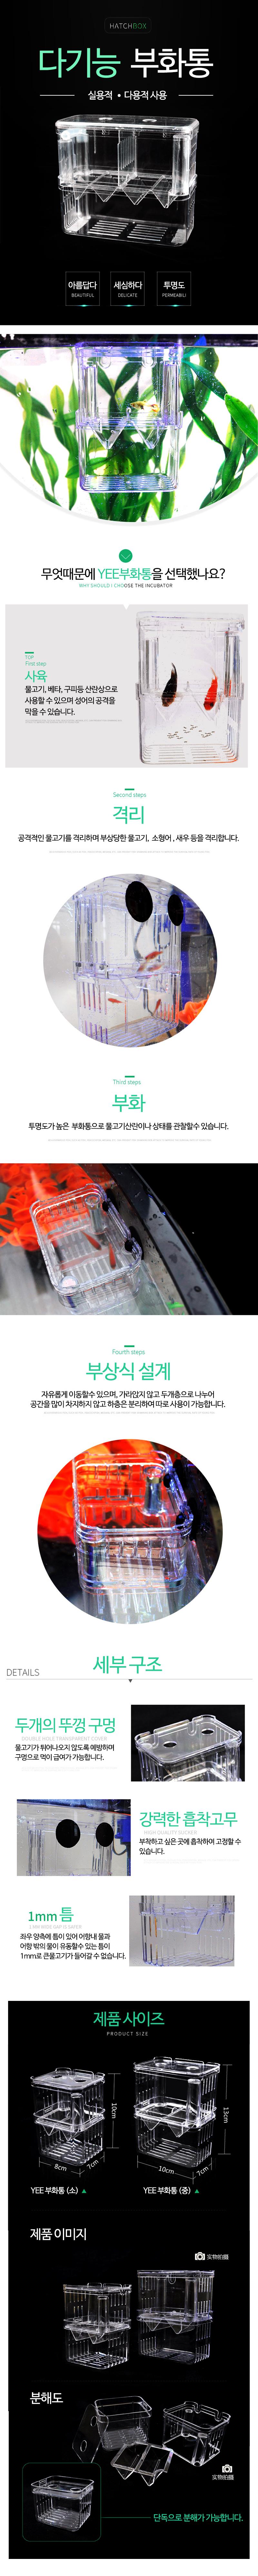 YEE 구피전용 다기능부화통 (소) - 미미네아쿠아, 2,500원, 청소용품, 청소도구